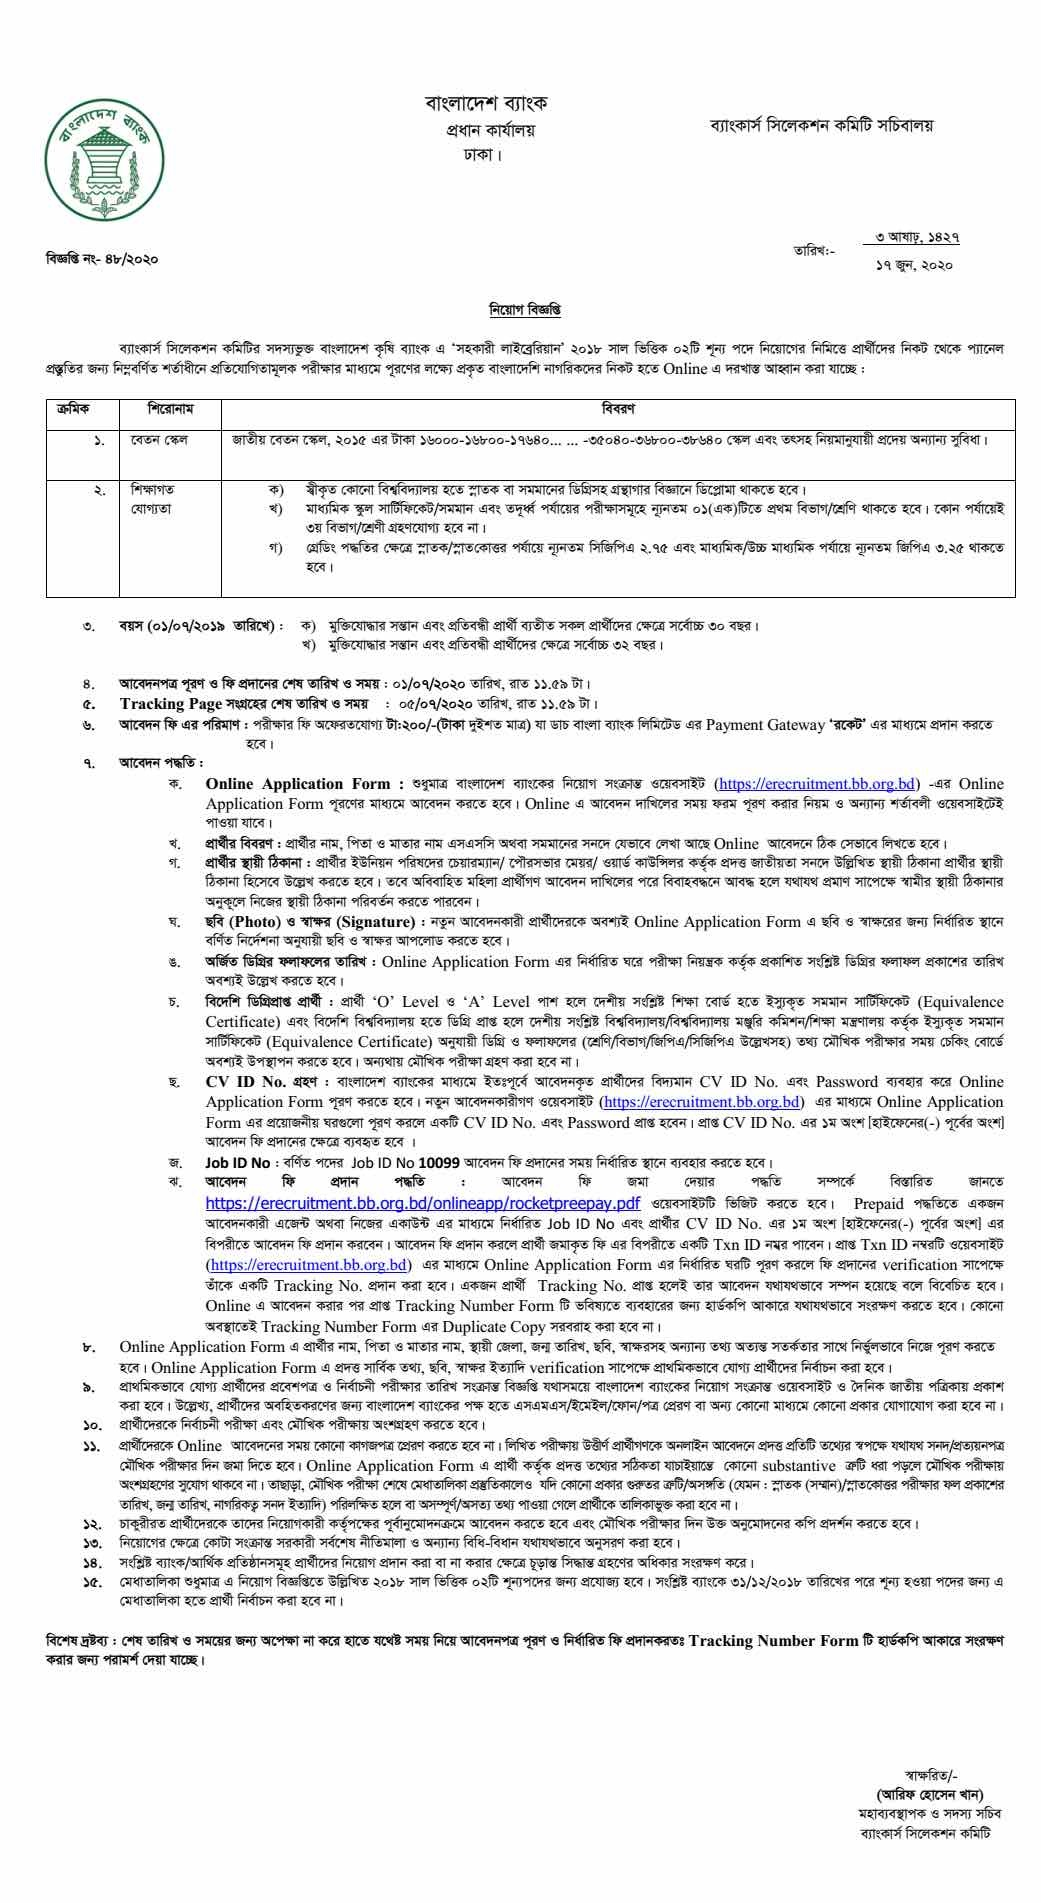 Bangladesh Krishi Bank Job Circular 2020